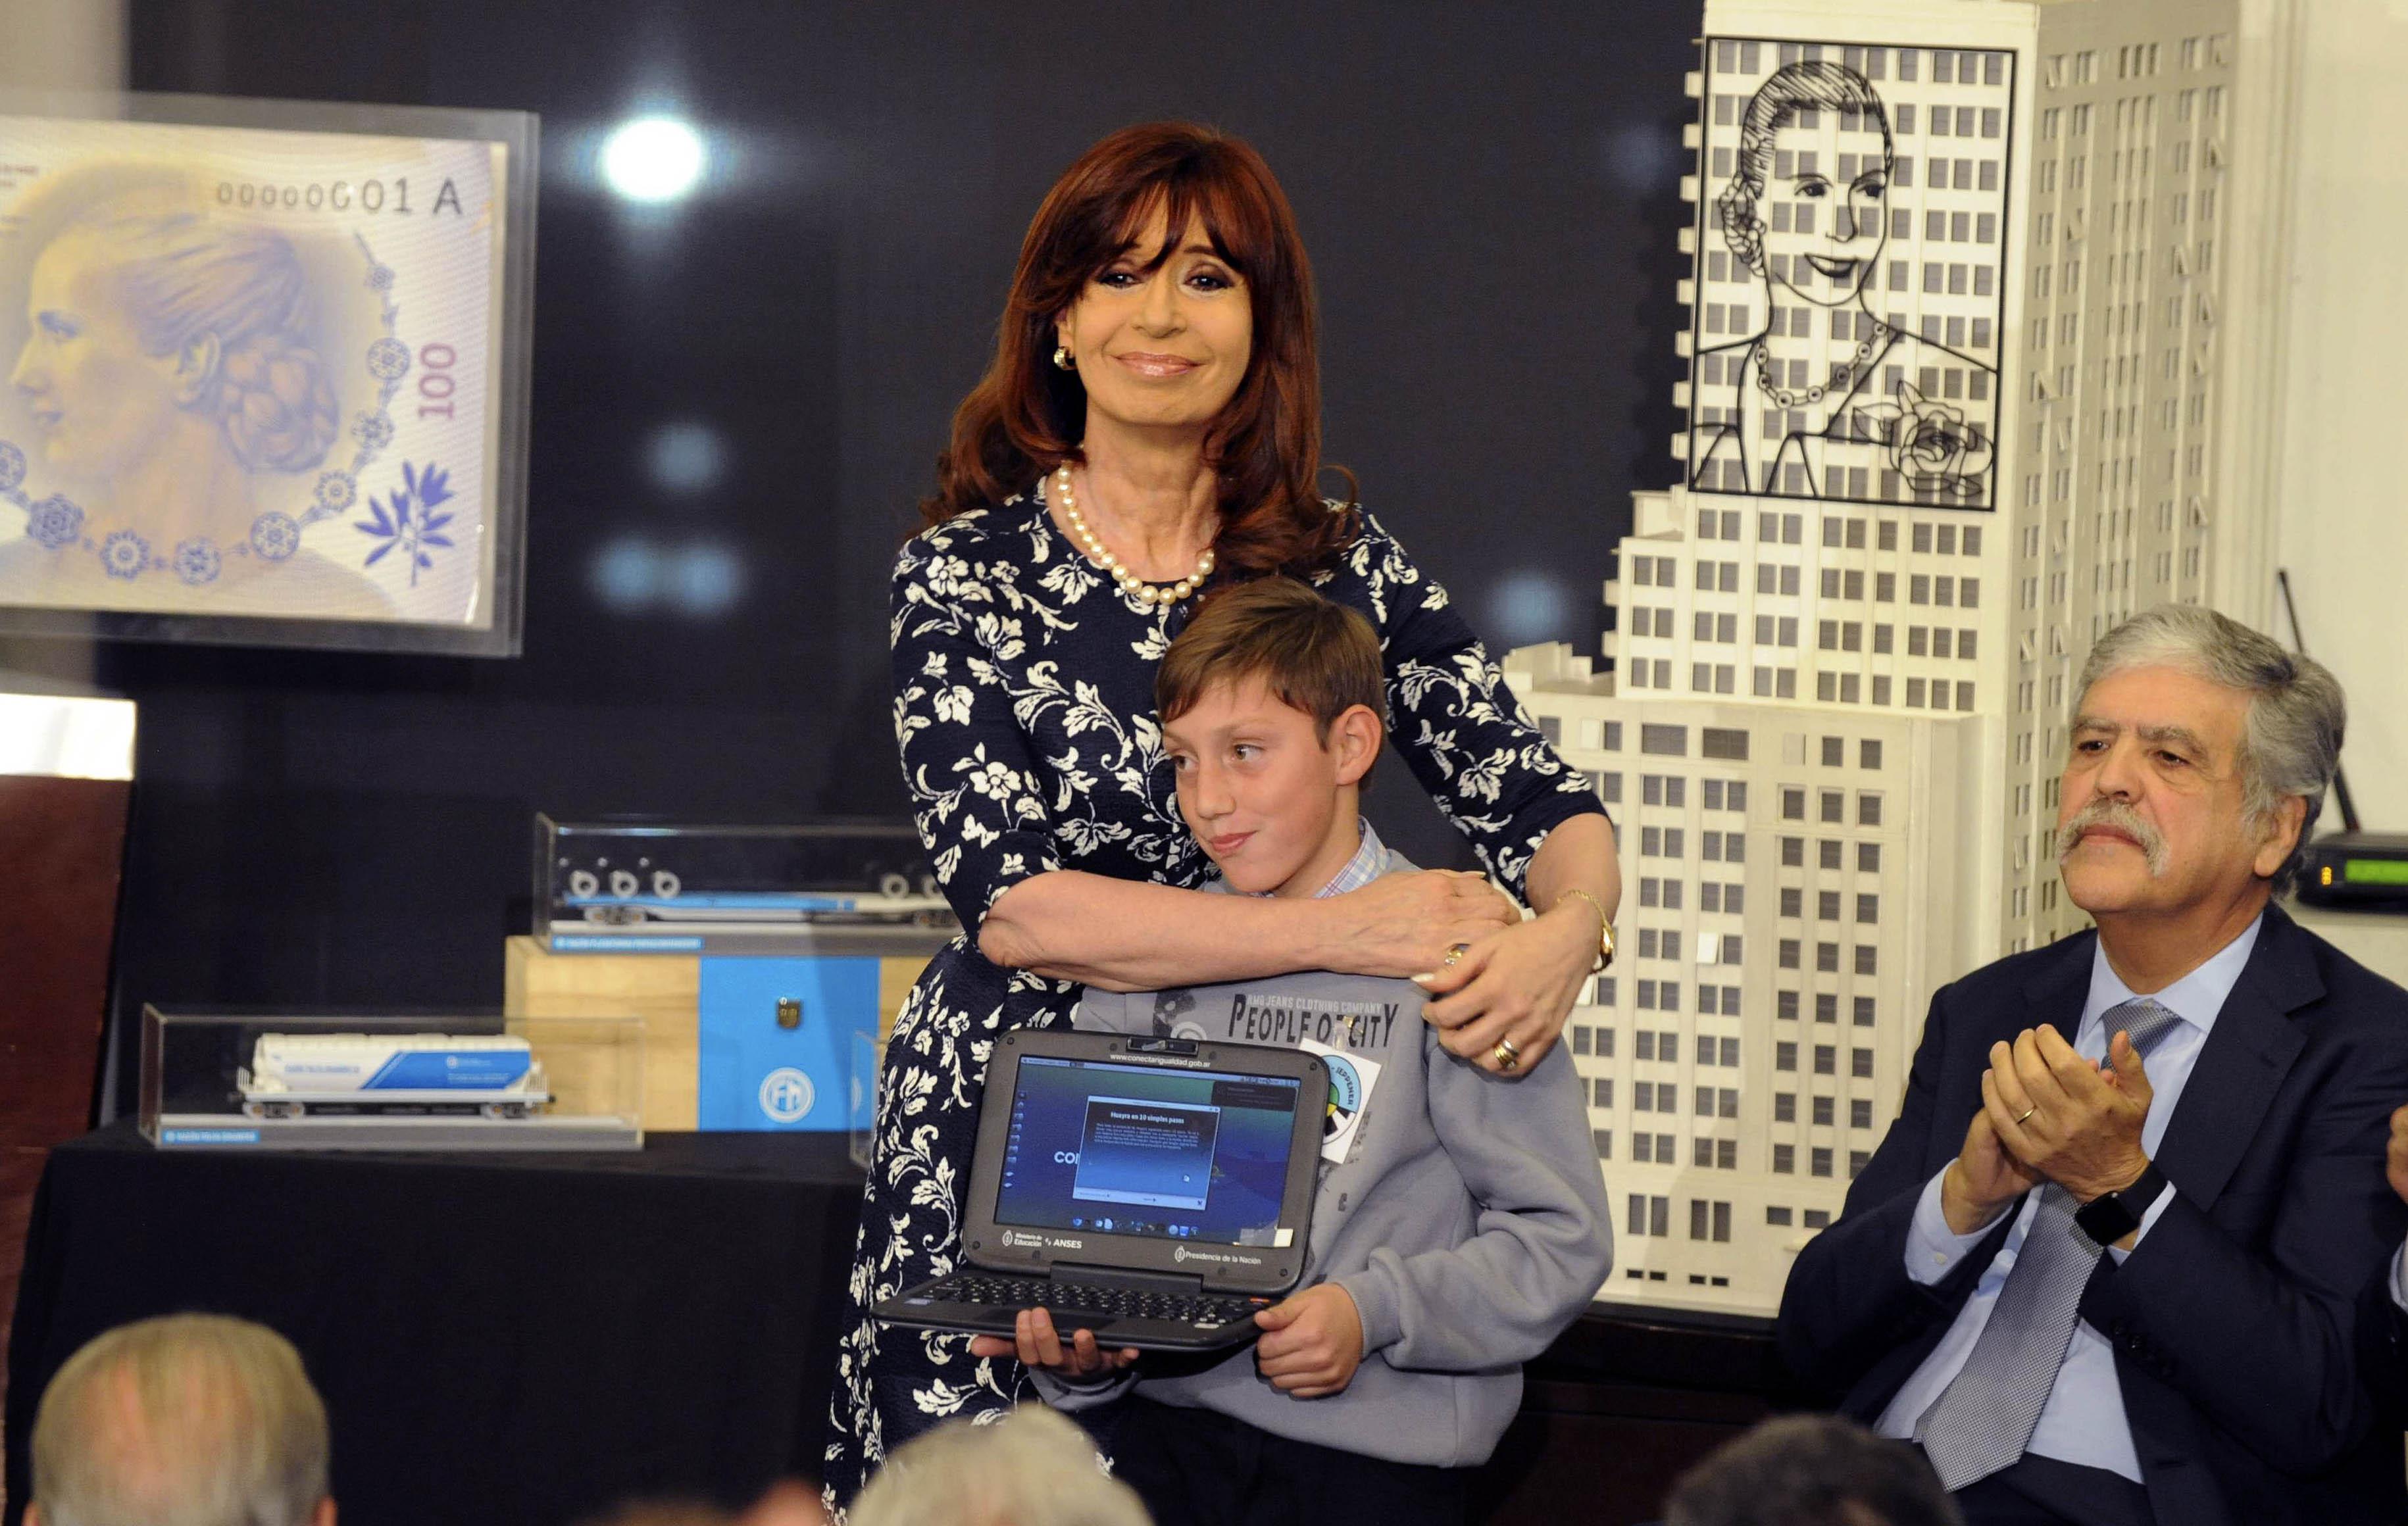 01-07-2015_buenos_aires_la_presidenta_cristina